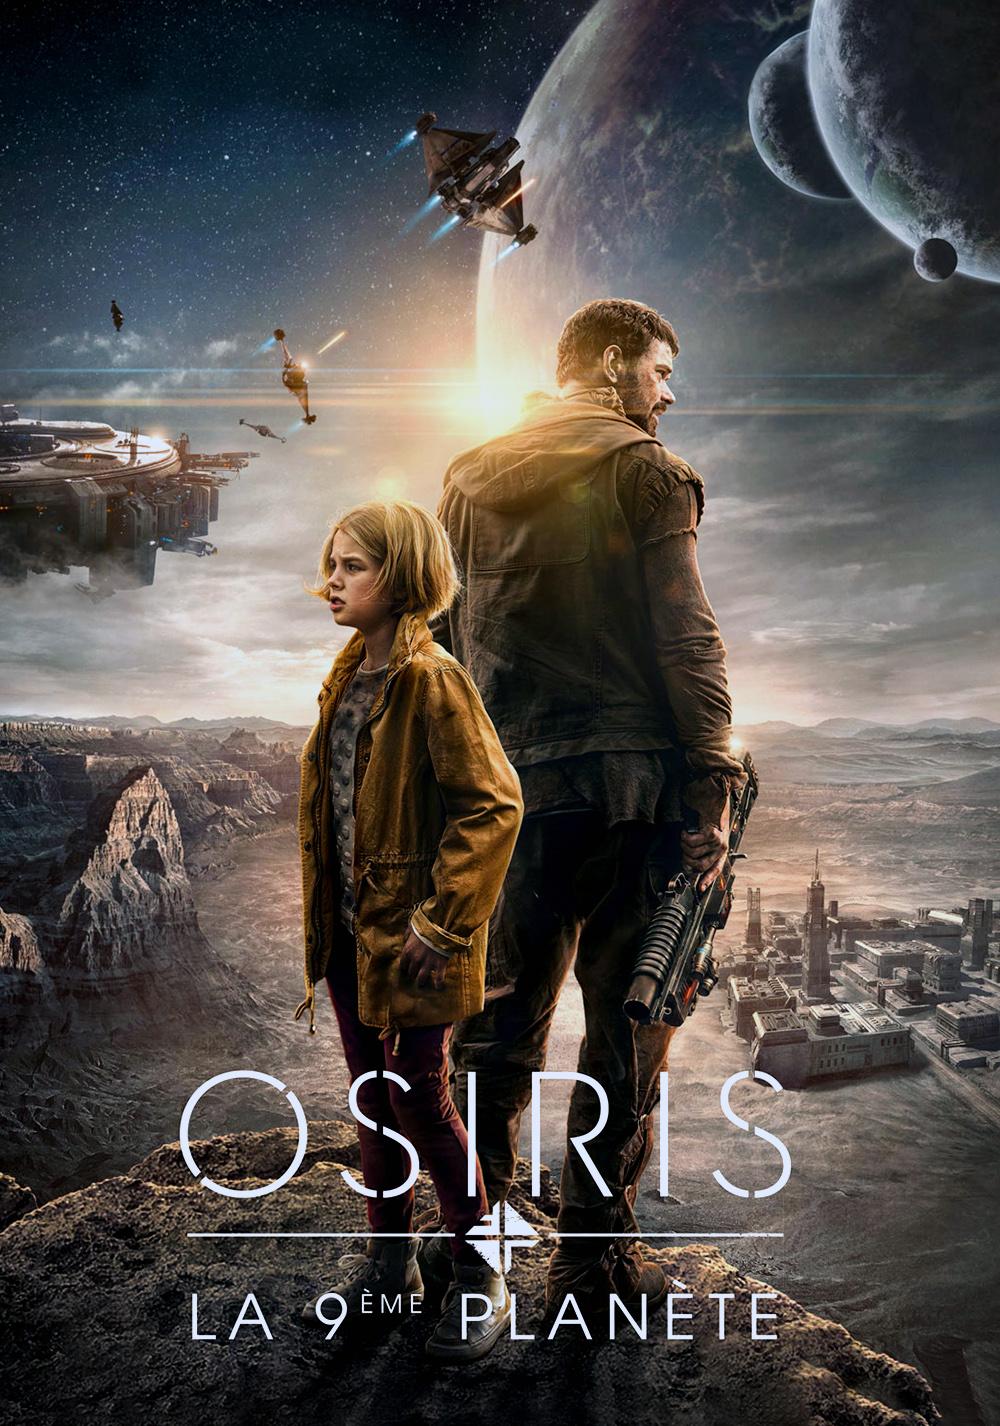 The Osiris Child Film